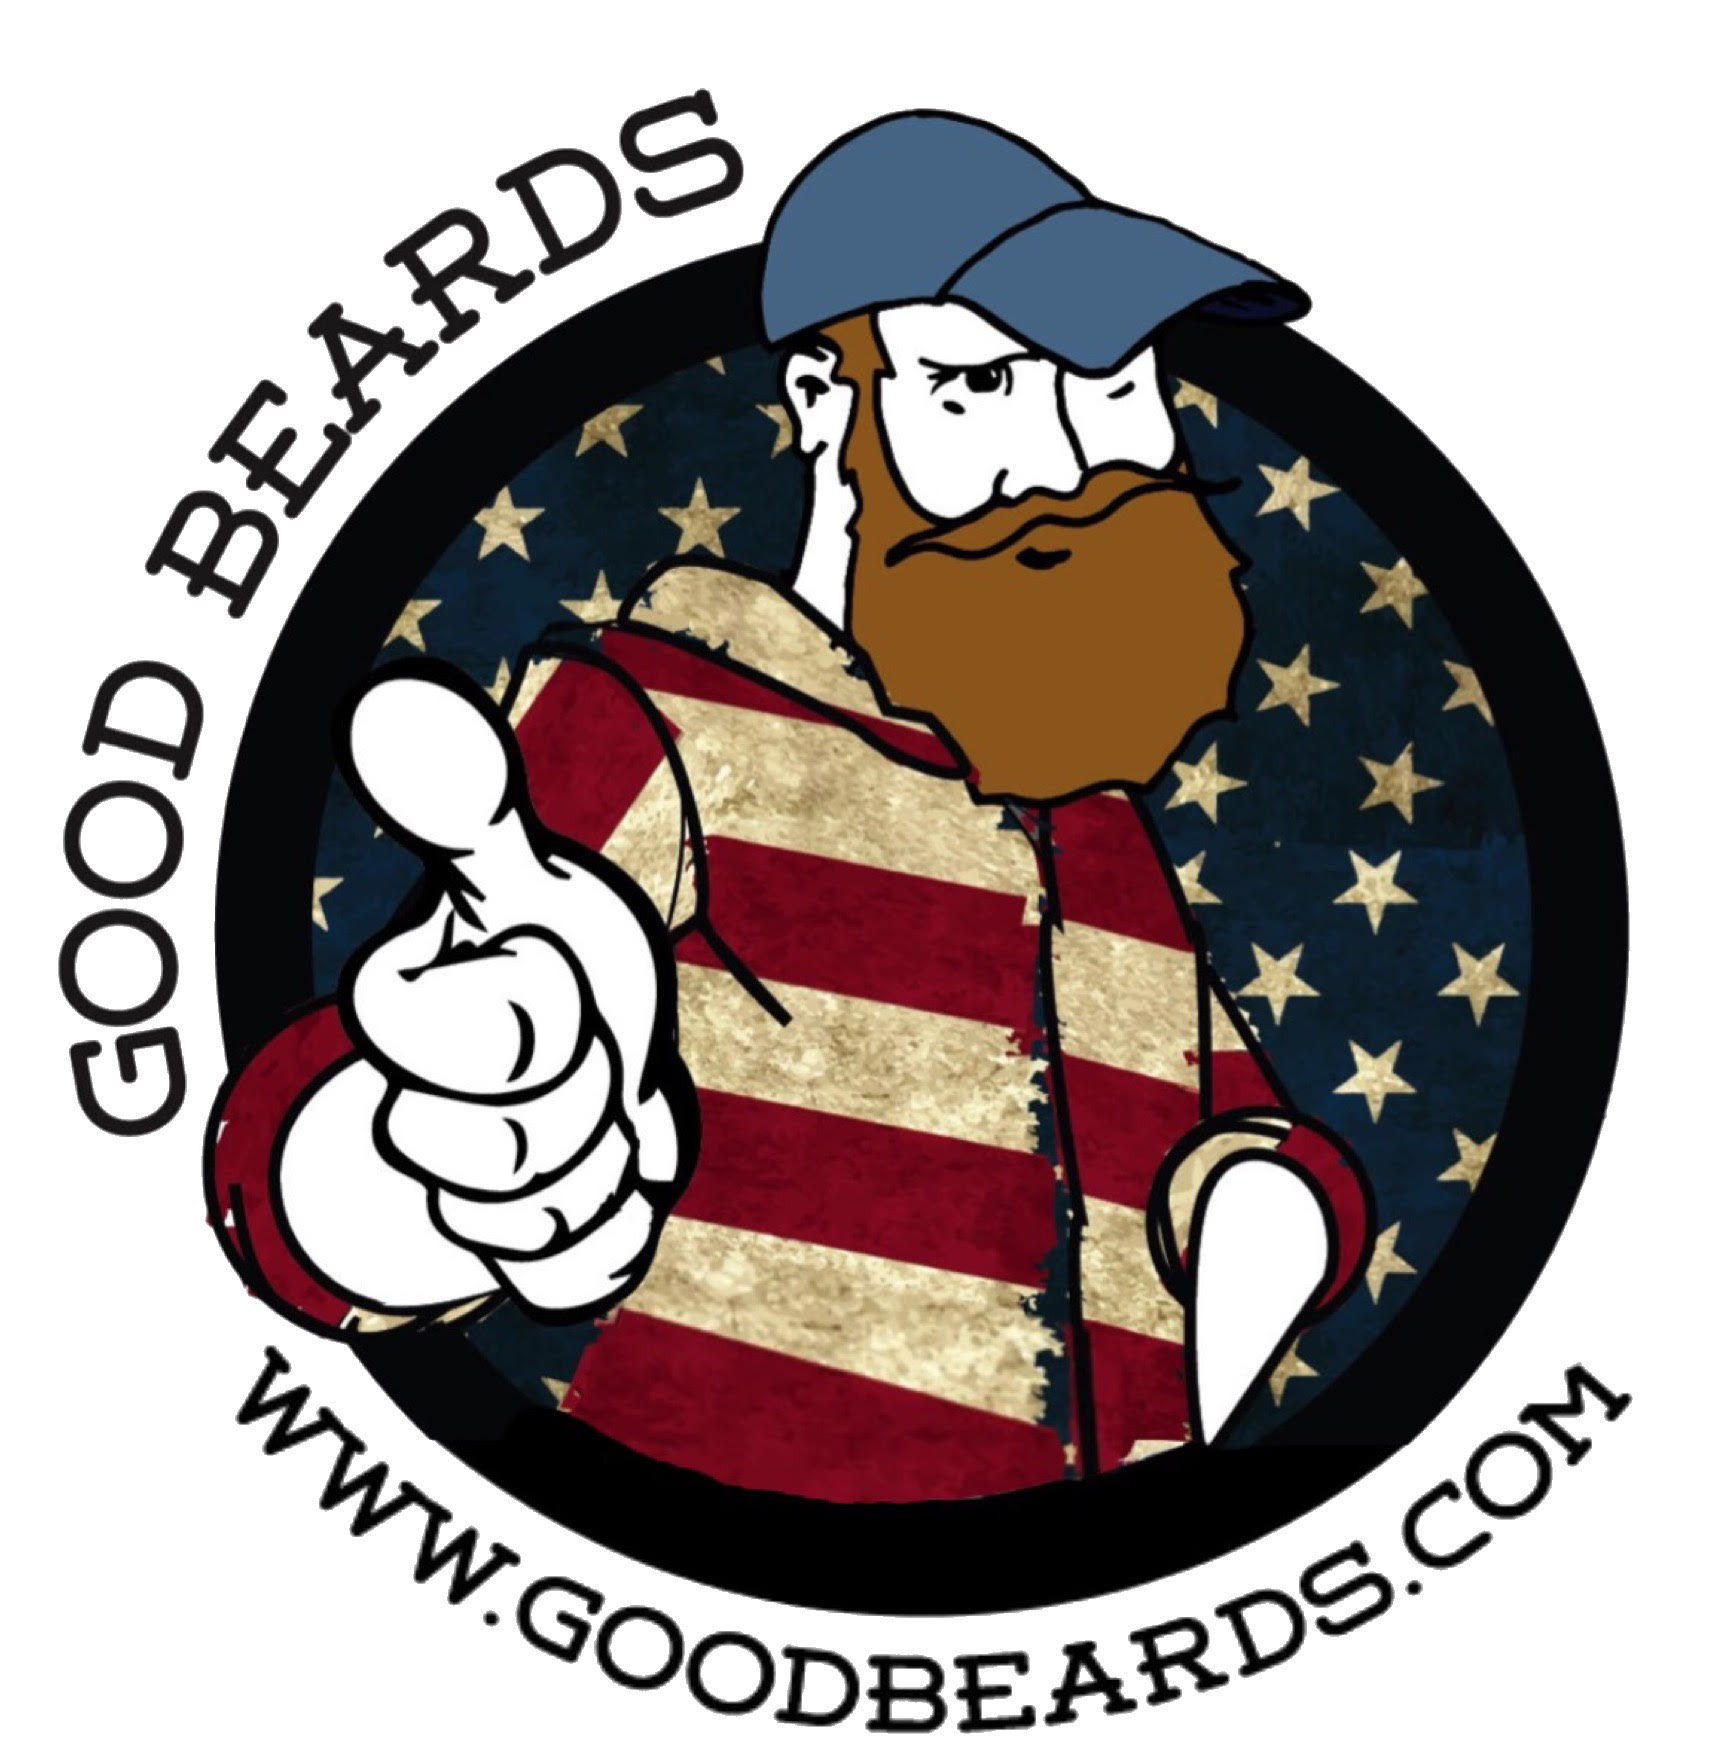 goodbeards logo.jpg